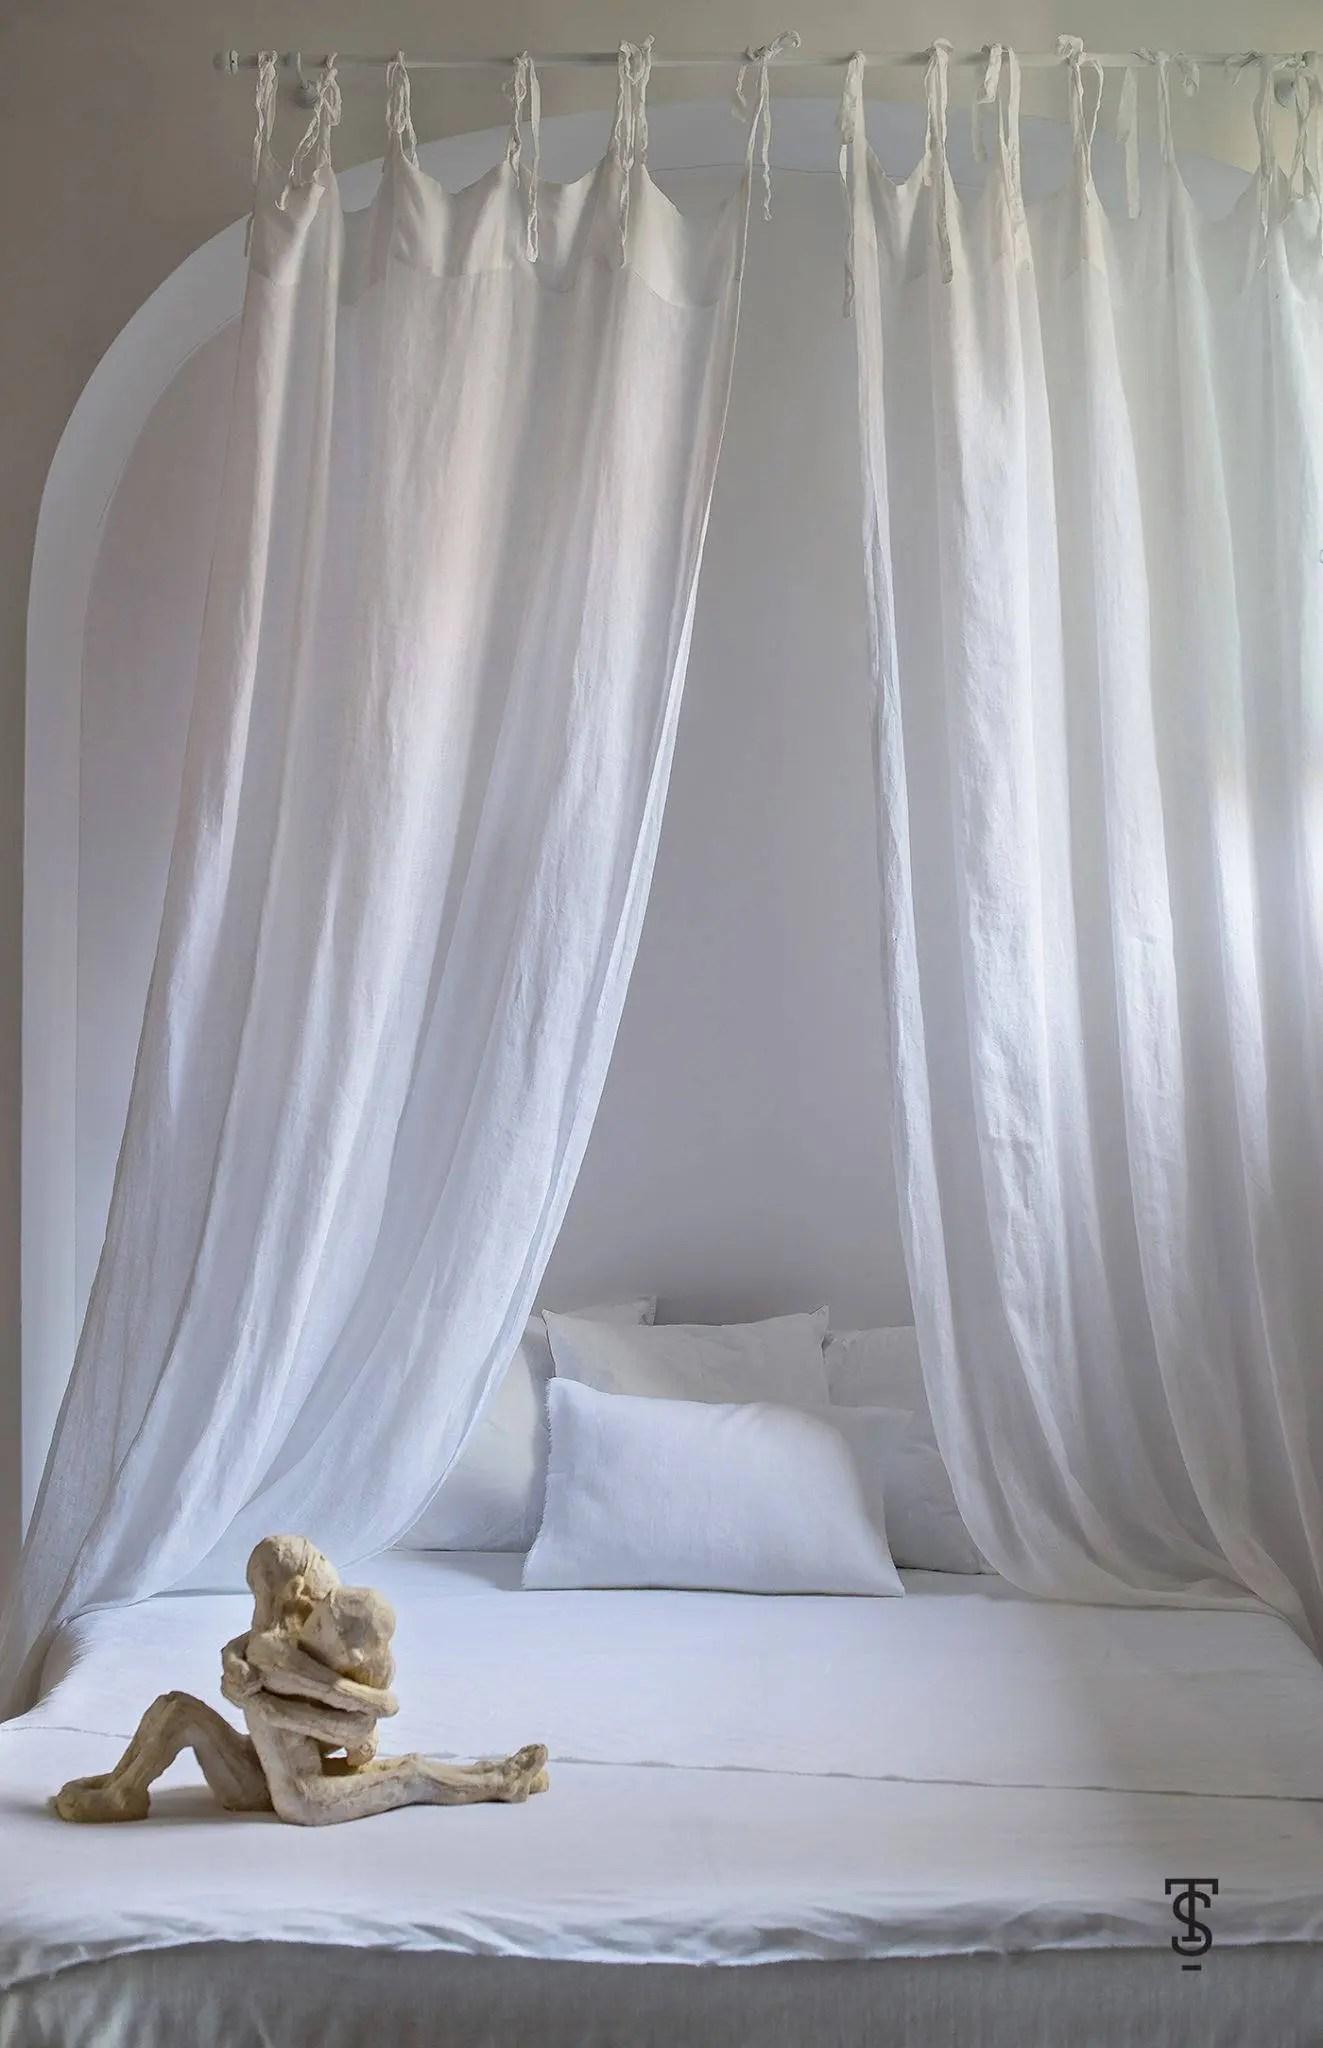 baldaquin de lit blanc verriere de lit de lin rideaux de lit de canopee auvent de lit auvent de lit de pure canopee de lit de filles rideaux de